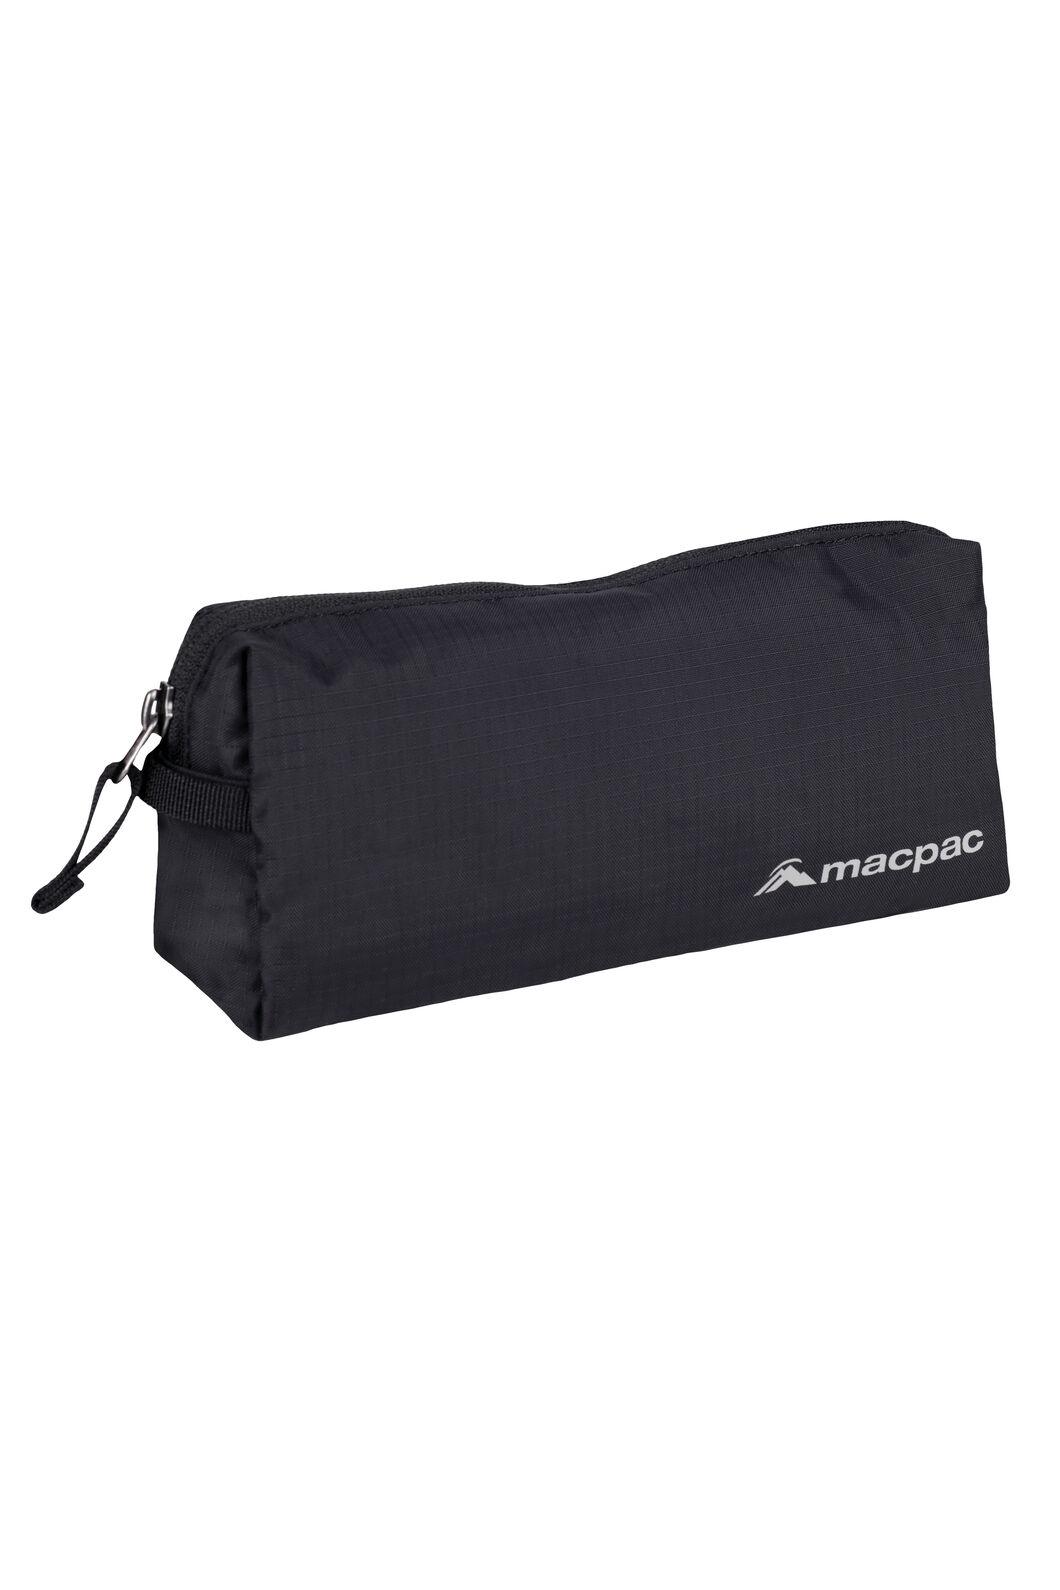 Macpac Carry-On Wash Bag, Black, hi-res